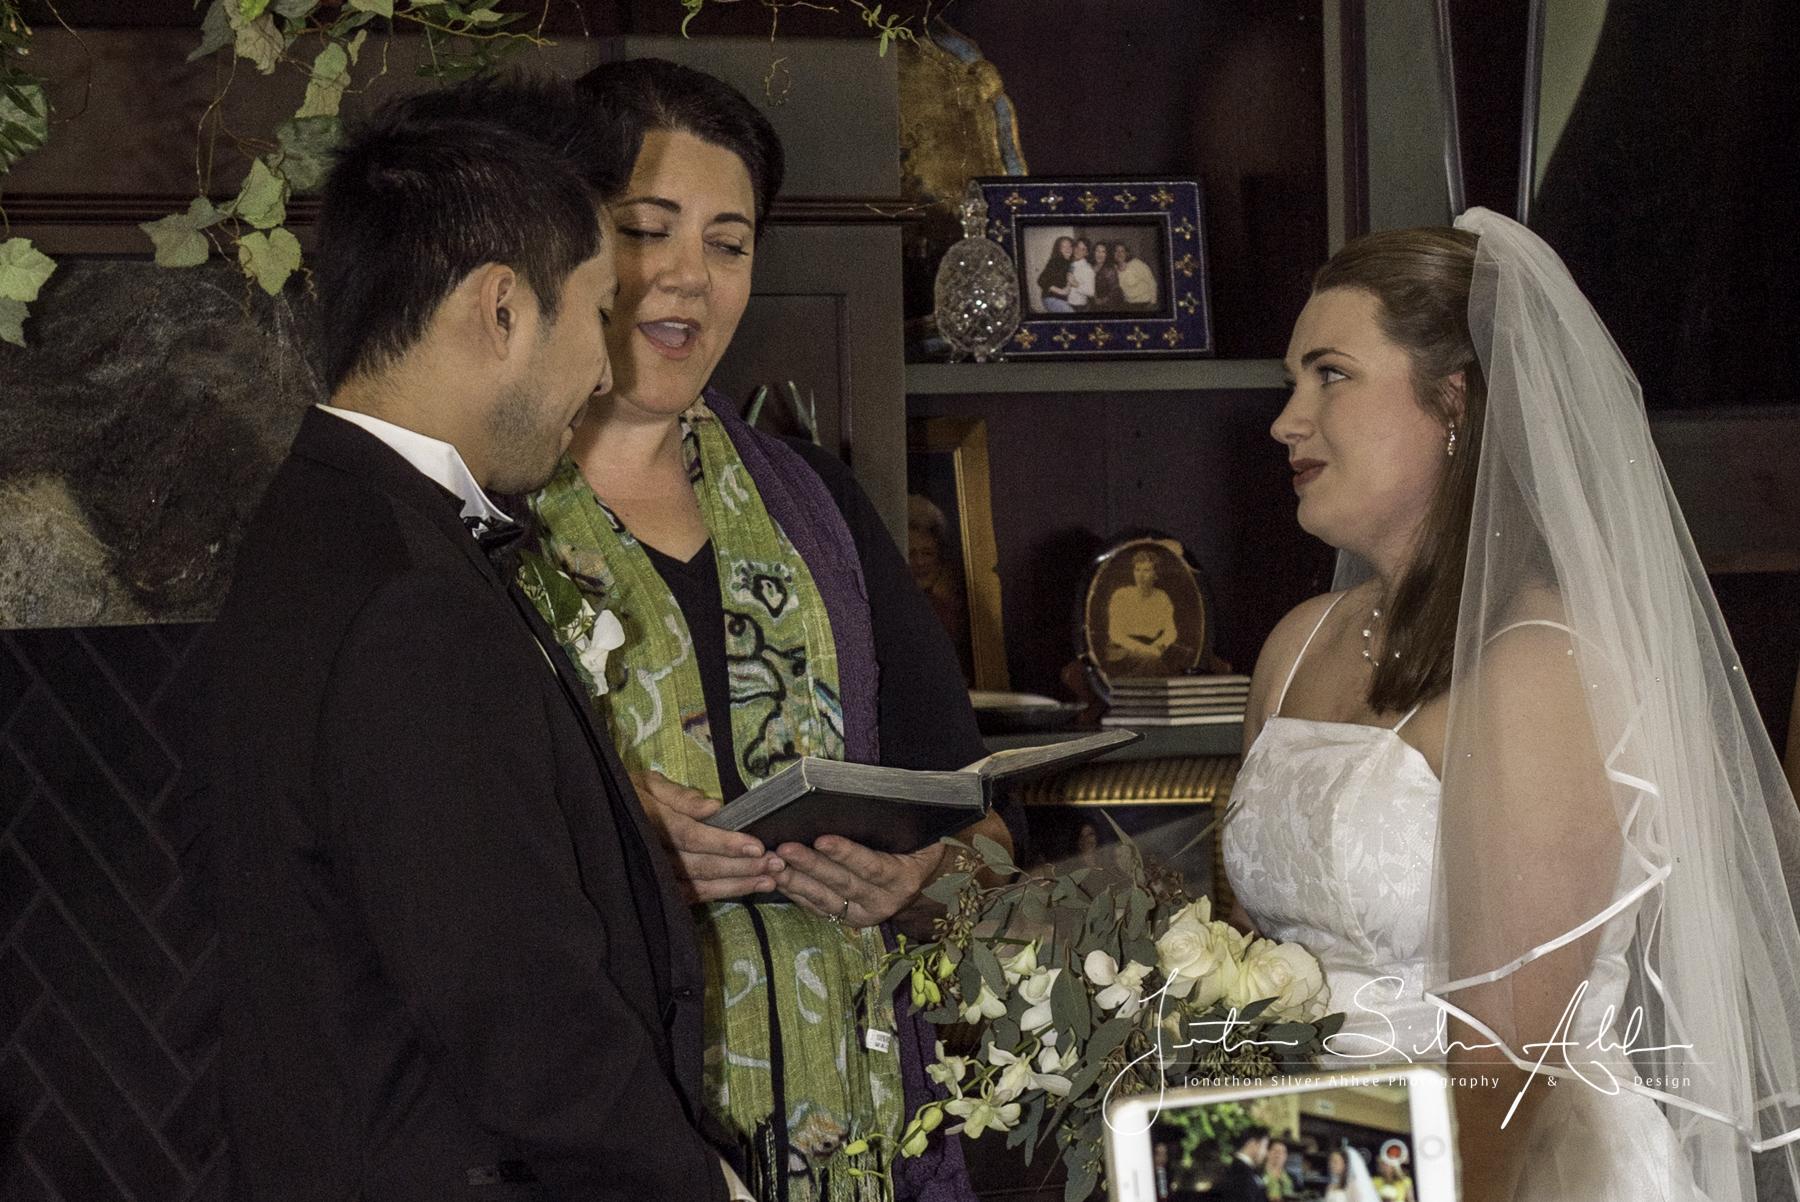 floral-wedding-35.jpg